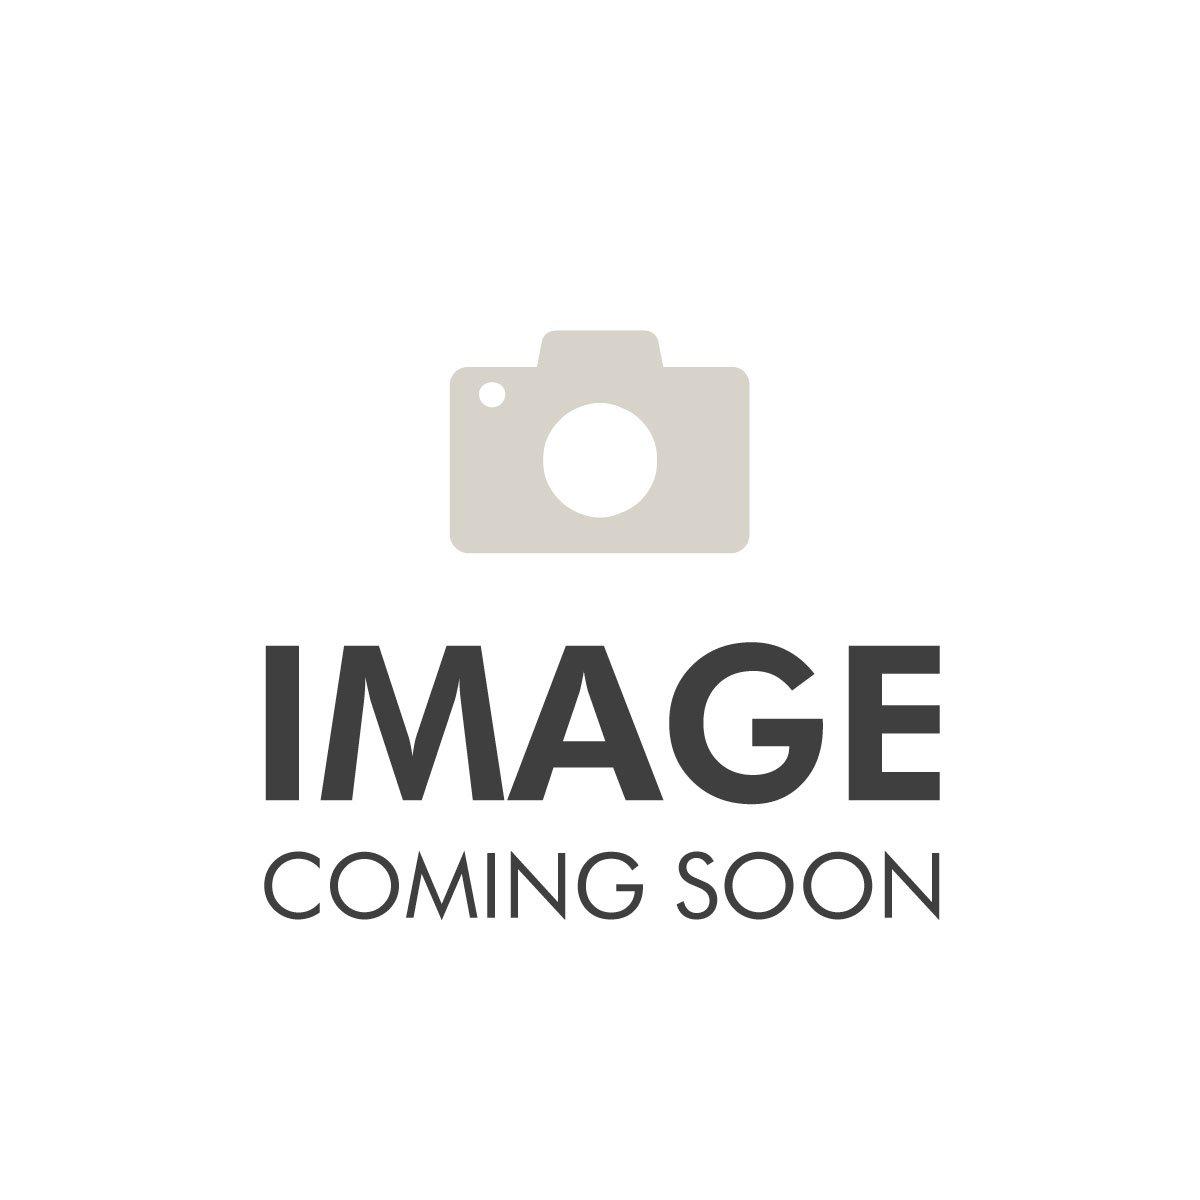 L'Oreal Loreal Accord Perfect Powder D5 Sable Doré